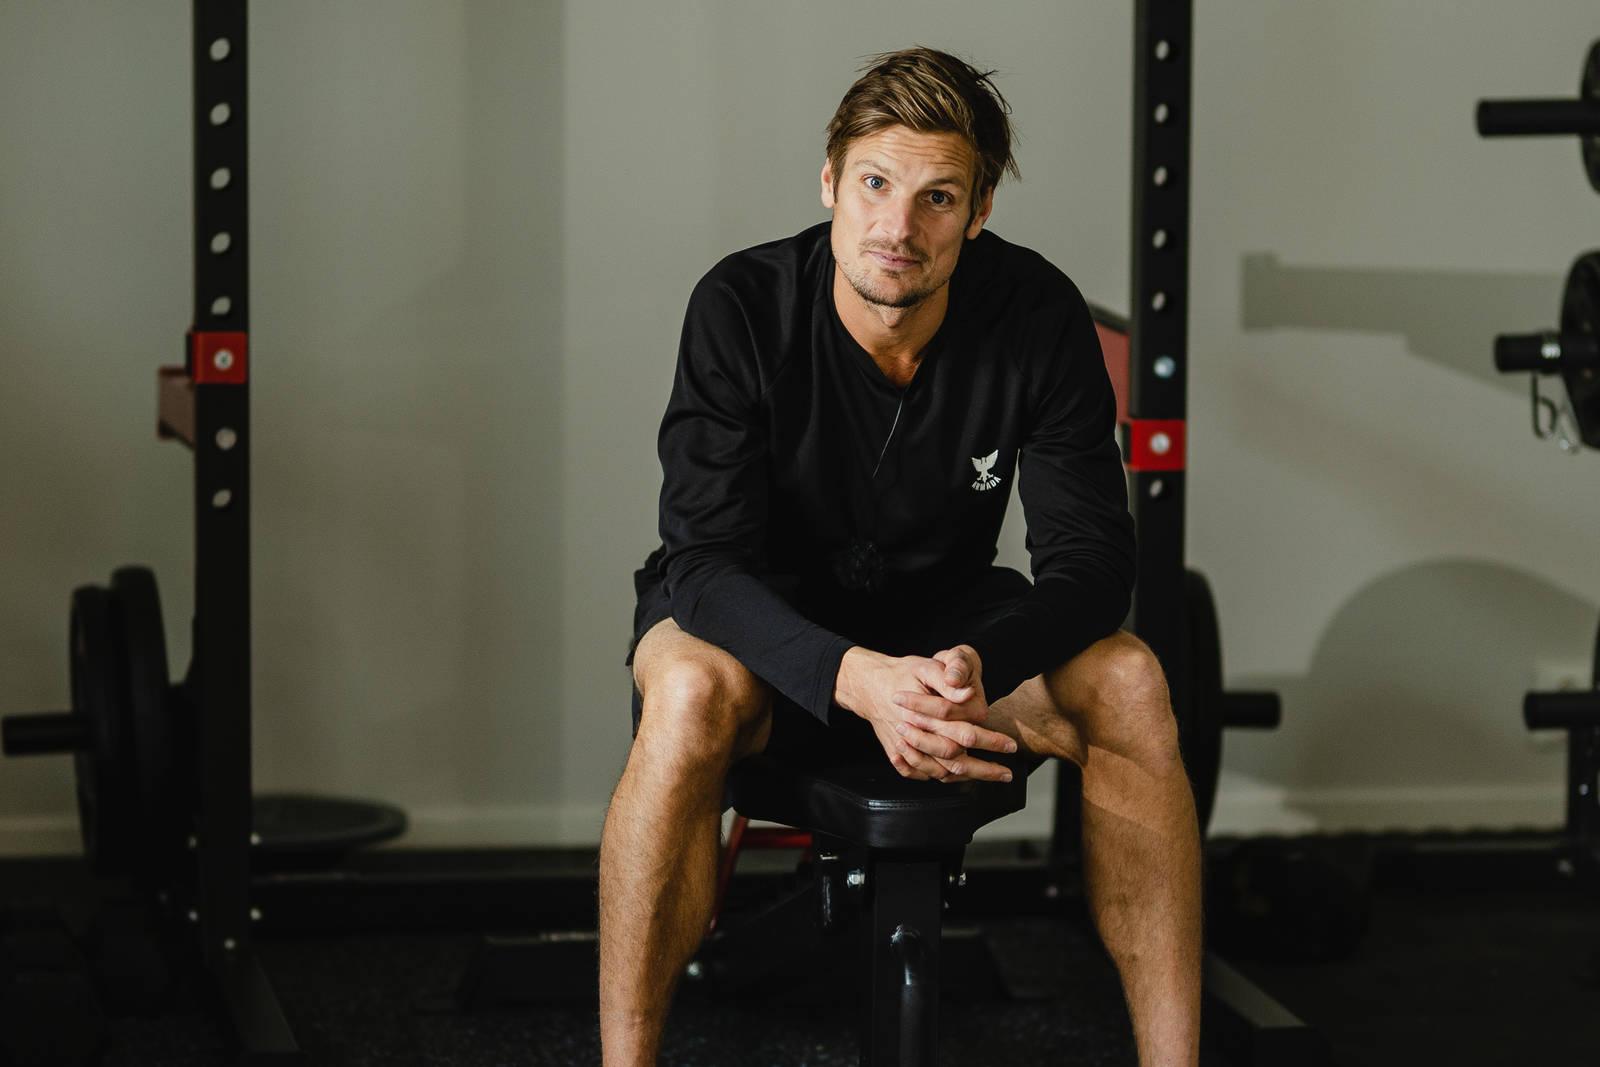 Spesialist i idrettssfysioterapi og manuellterapeut på Olympiatoppen Lars Haugvad. Bilde: Christian Nerdrum